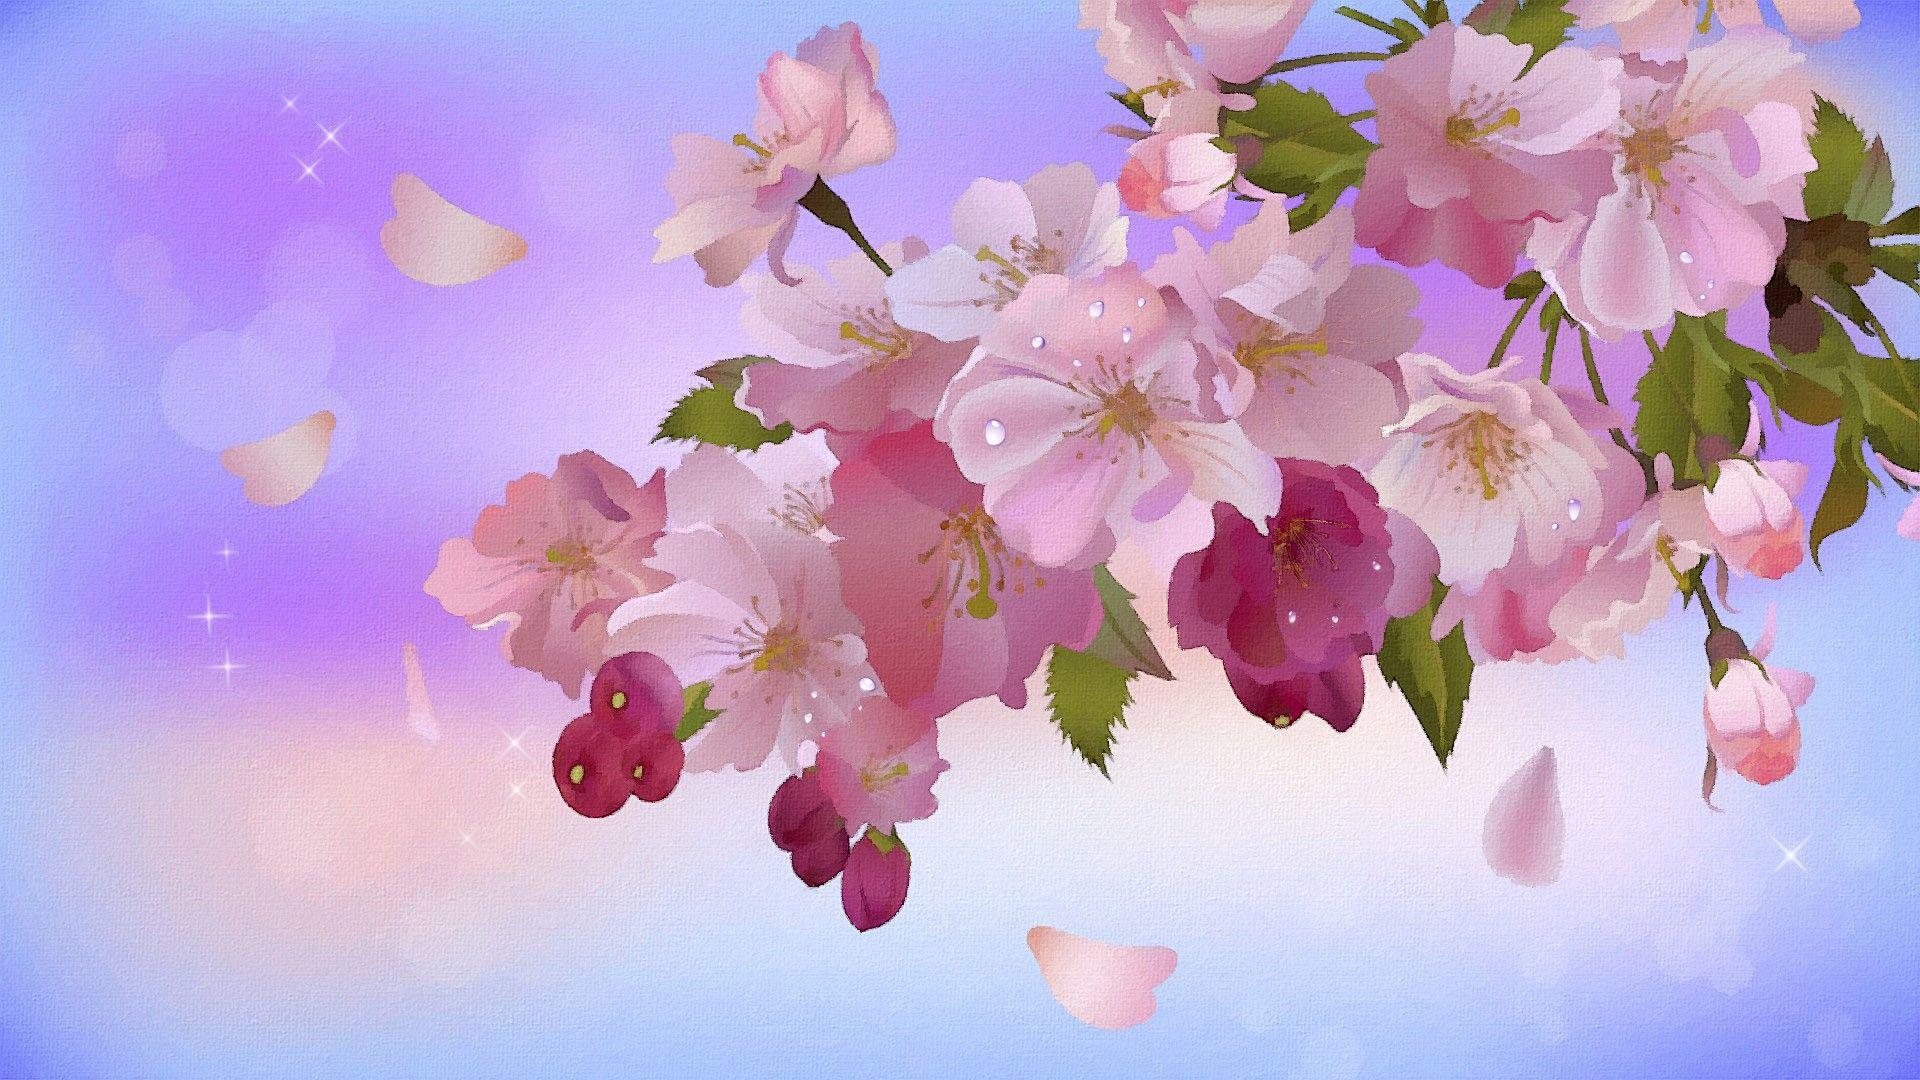 Fondos De Flores Wallpapers Hd Gratis: Una Pintura De Flores Hd 1920x1080